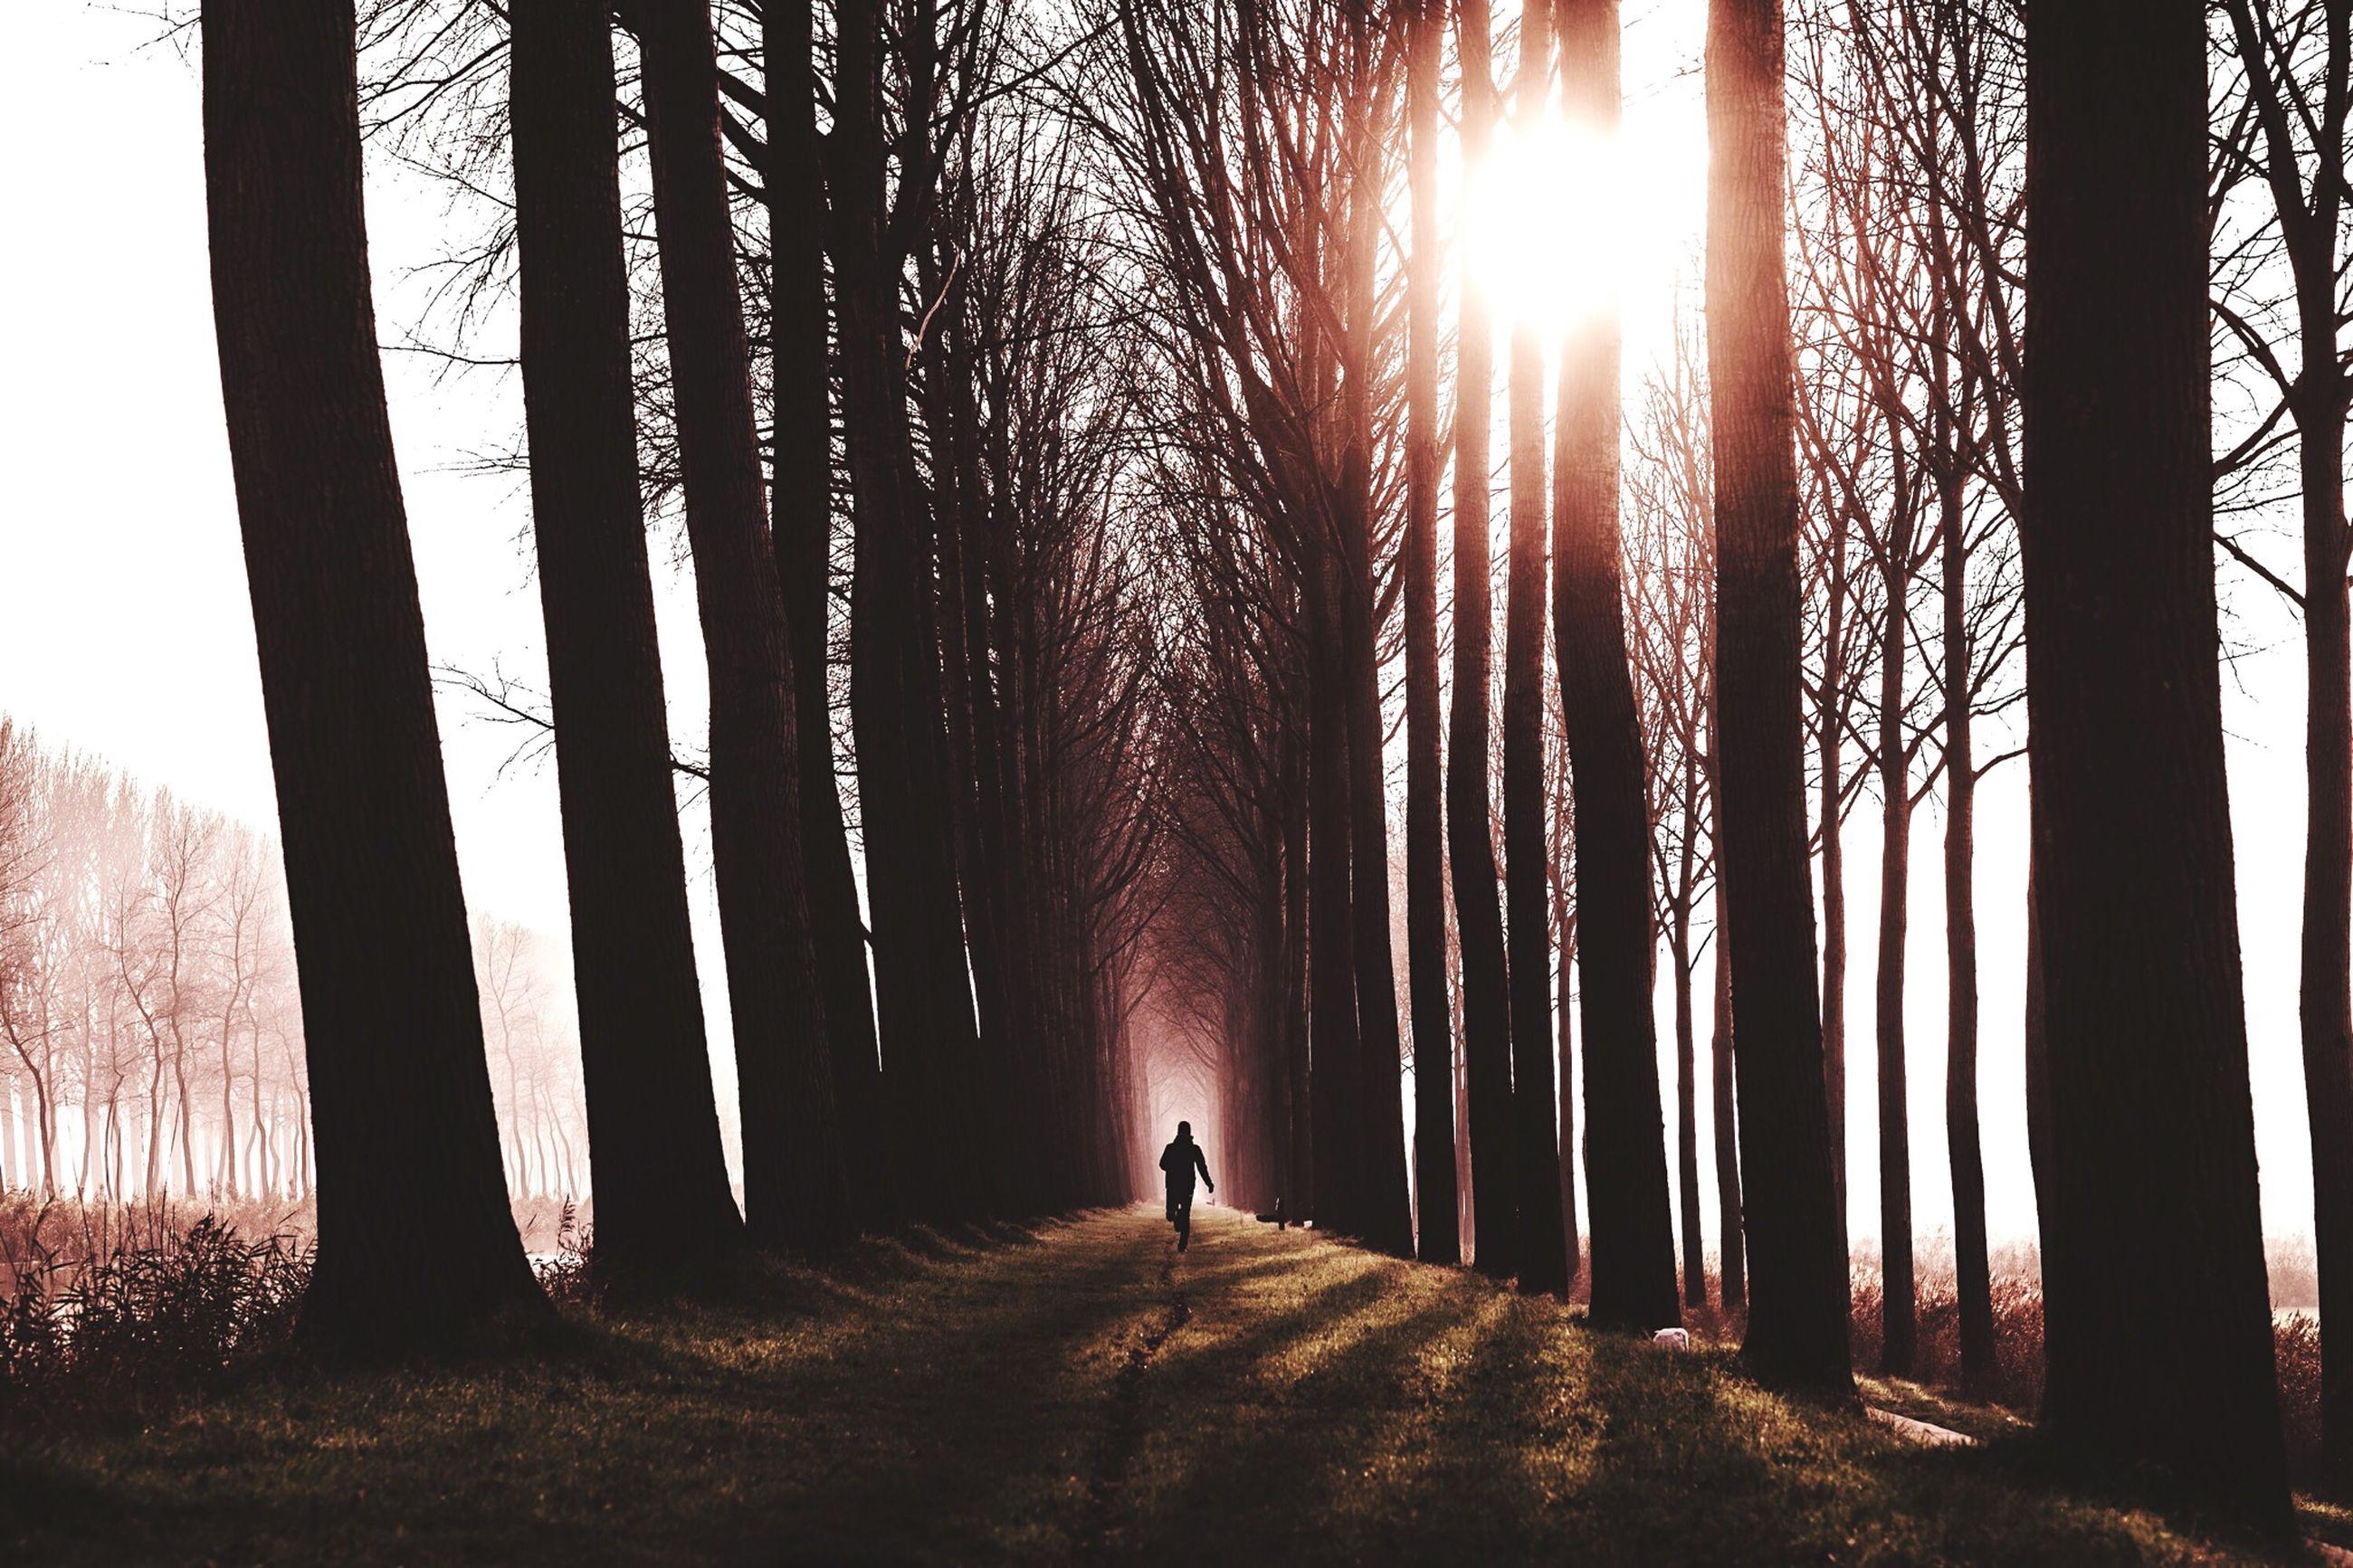 tree, sun, tree trunk, silhouette, tranquility, tranquil scene, sunbeam, sunlight, forest, nature, lens flare, scenics, beauty in nature, woodland, sunset, walking, landscape, non-urban scene, back lit